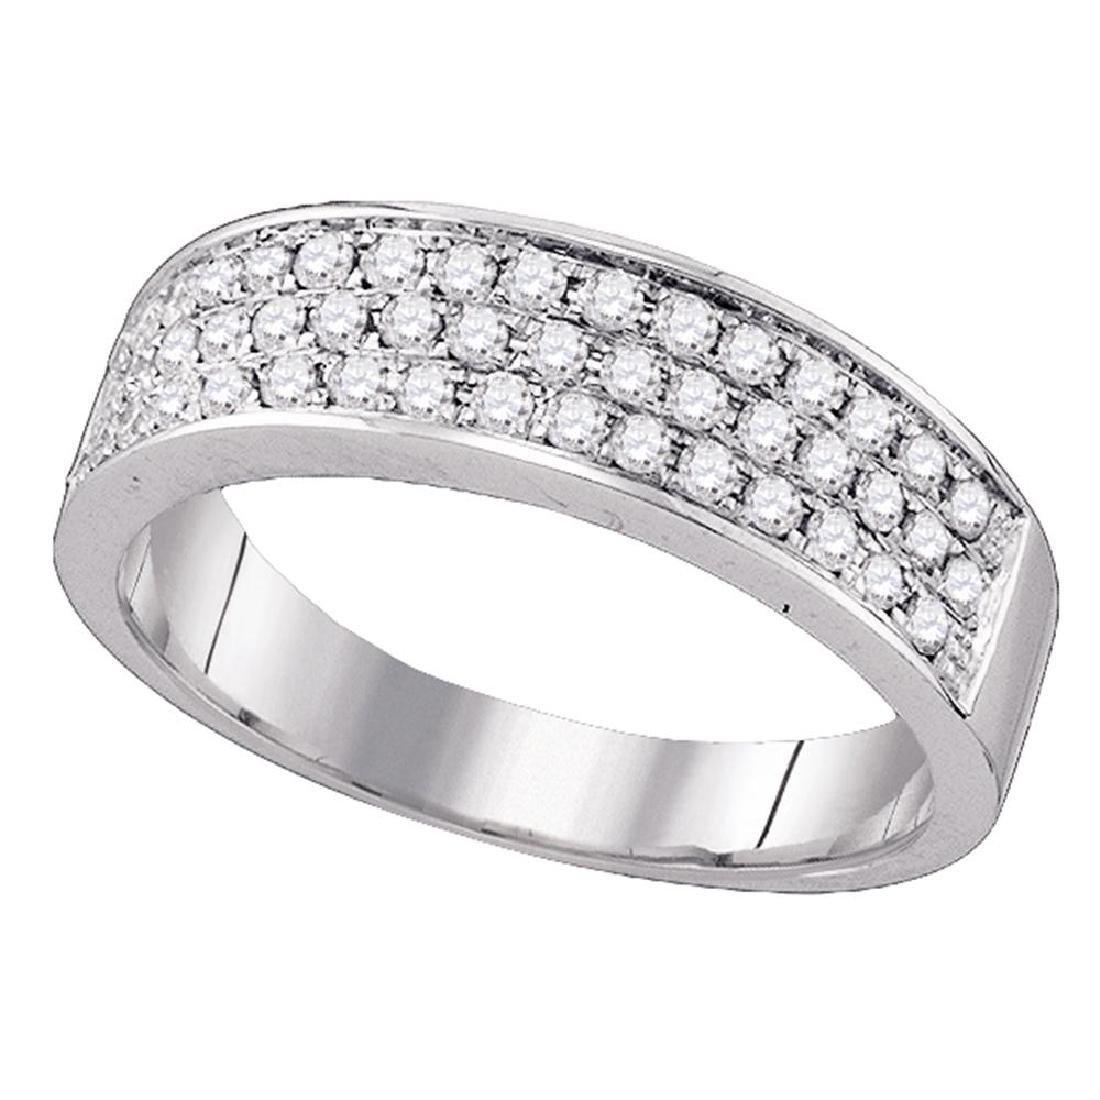 0.49 CTW Diamond Ring 10KT White Gold - REF-41H9M